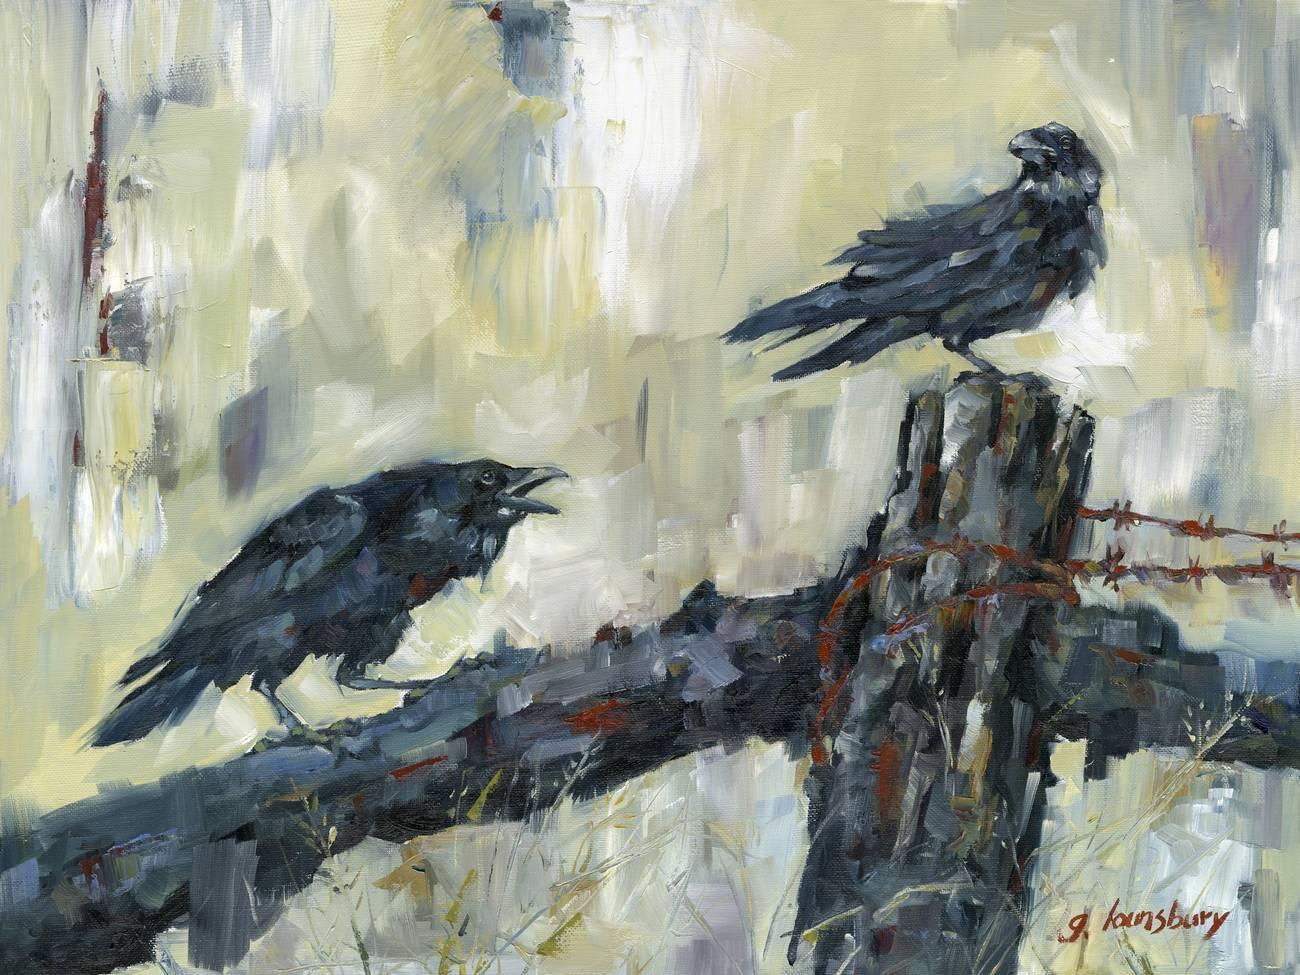 Grant Lounsbury - Poe's Ravens - 18x24 - Oil